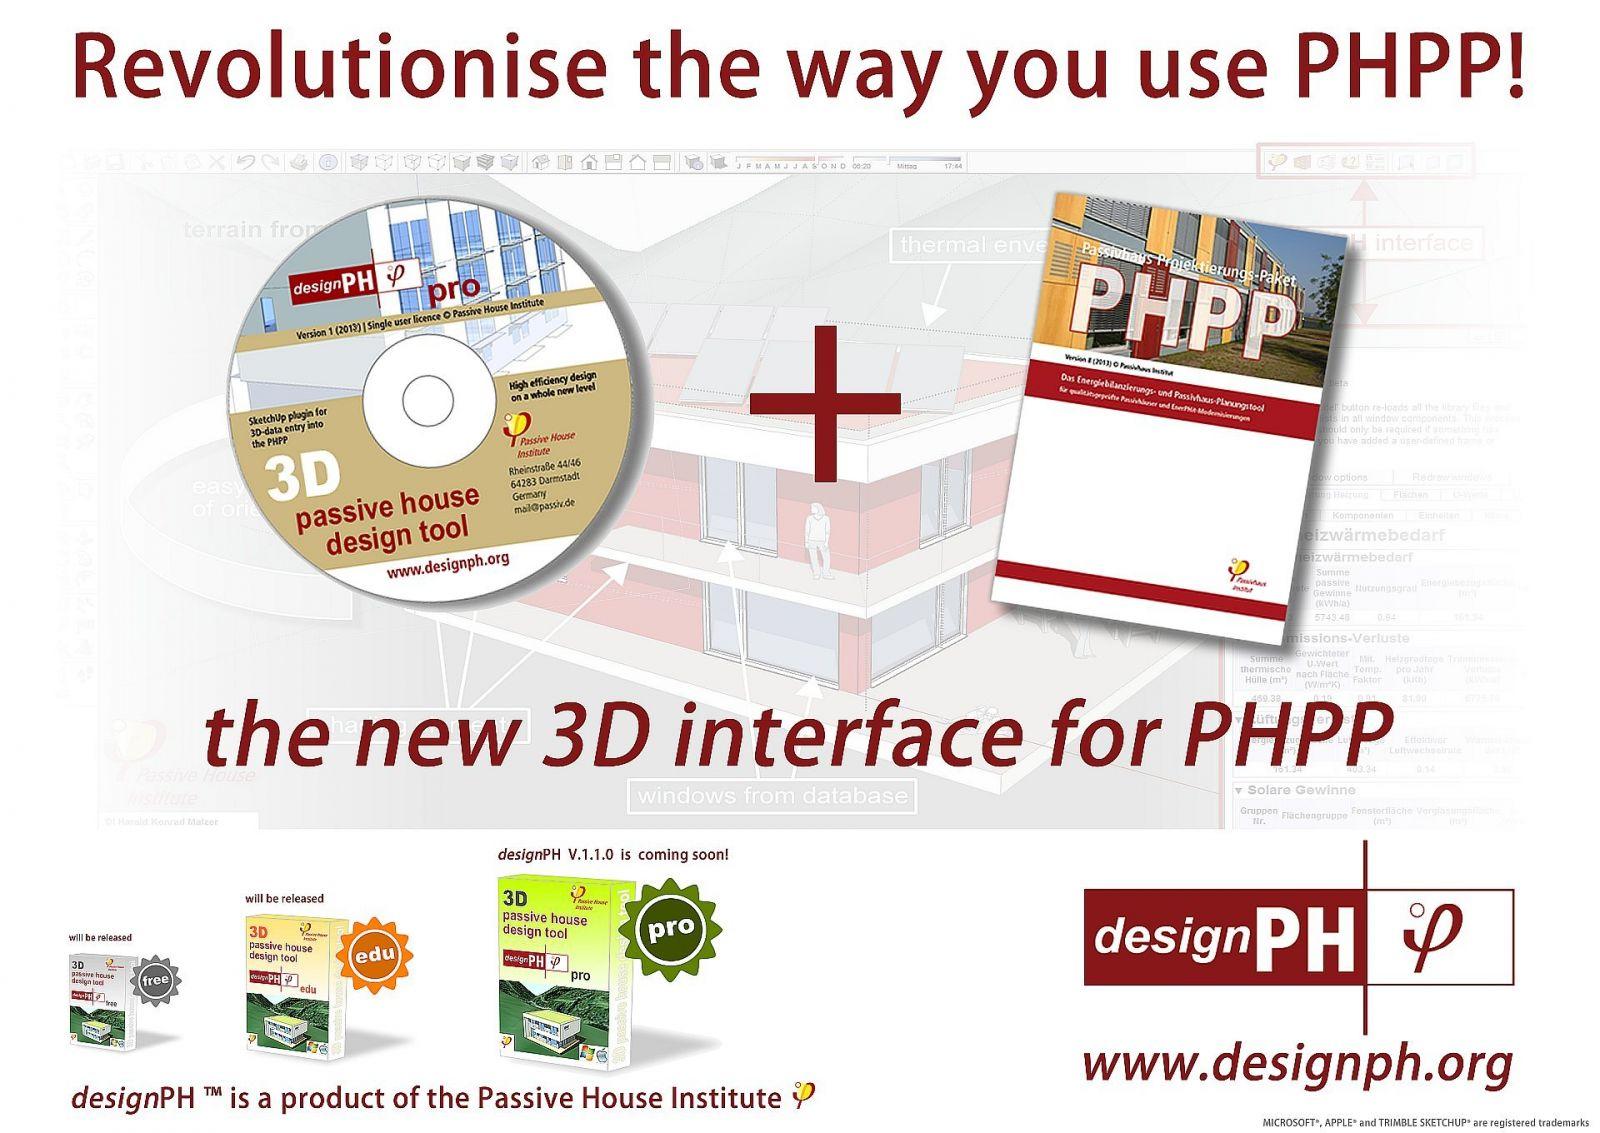 designPH_Revolution_01_EN